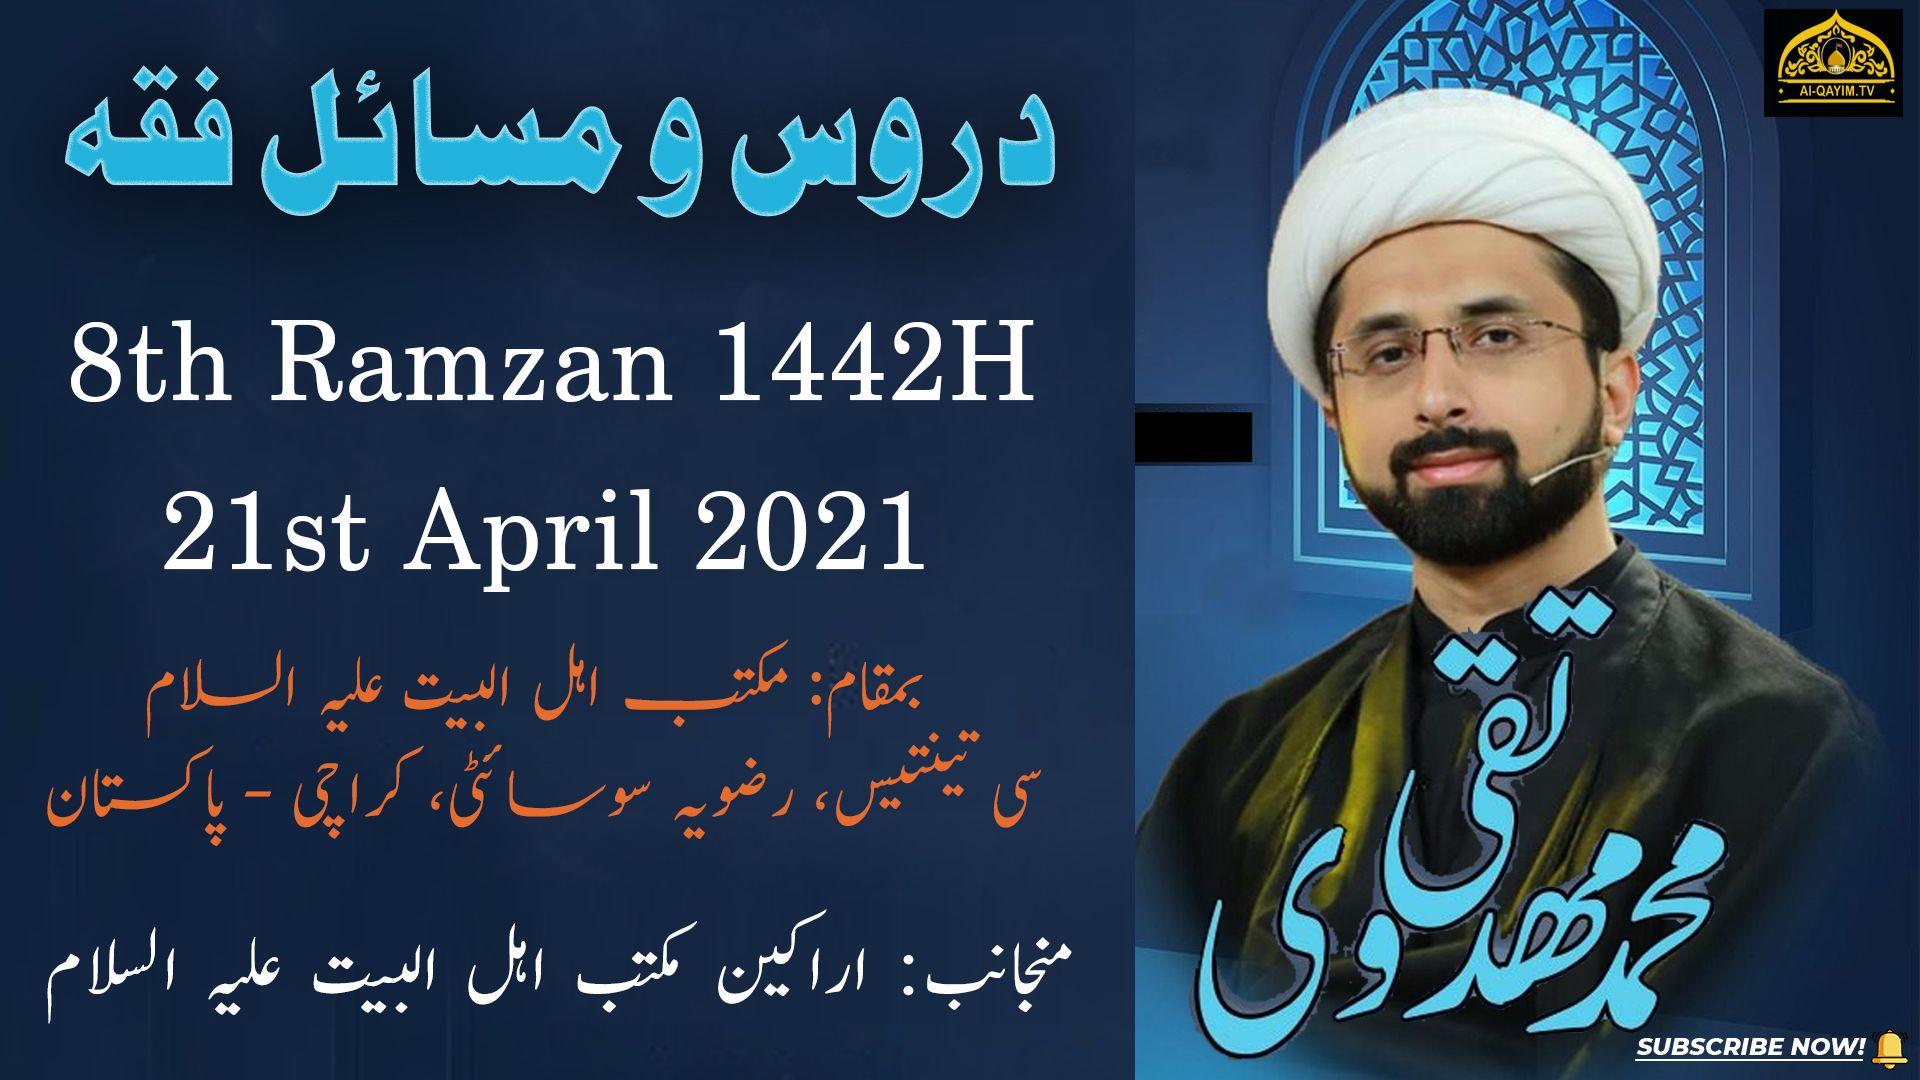 Moulana Muhammad Taqi Mehdavi | Dars Wo Masail Fiqae | 8th Ramzan 2021 | Maktab-e-Ahlebait - Karachi